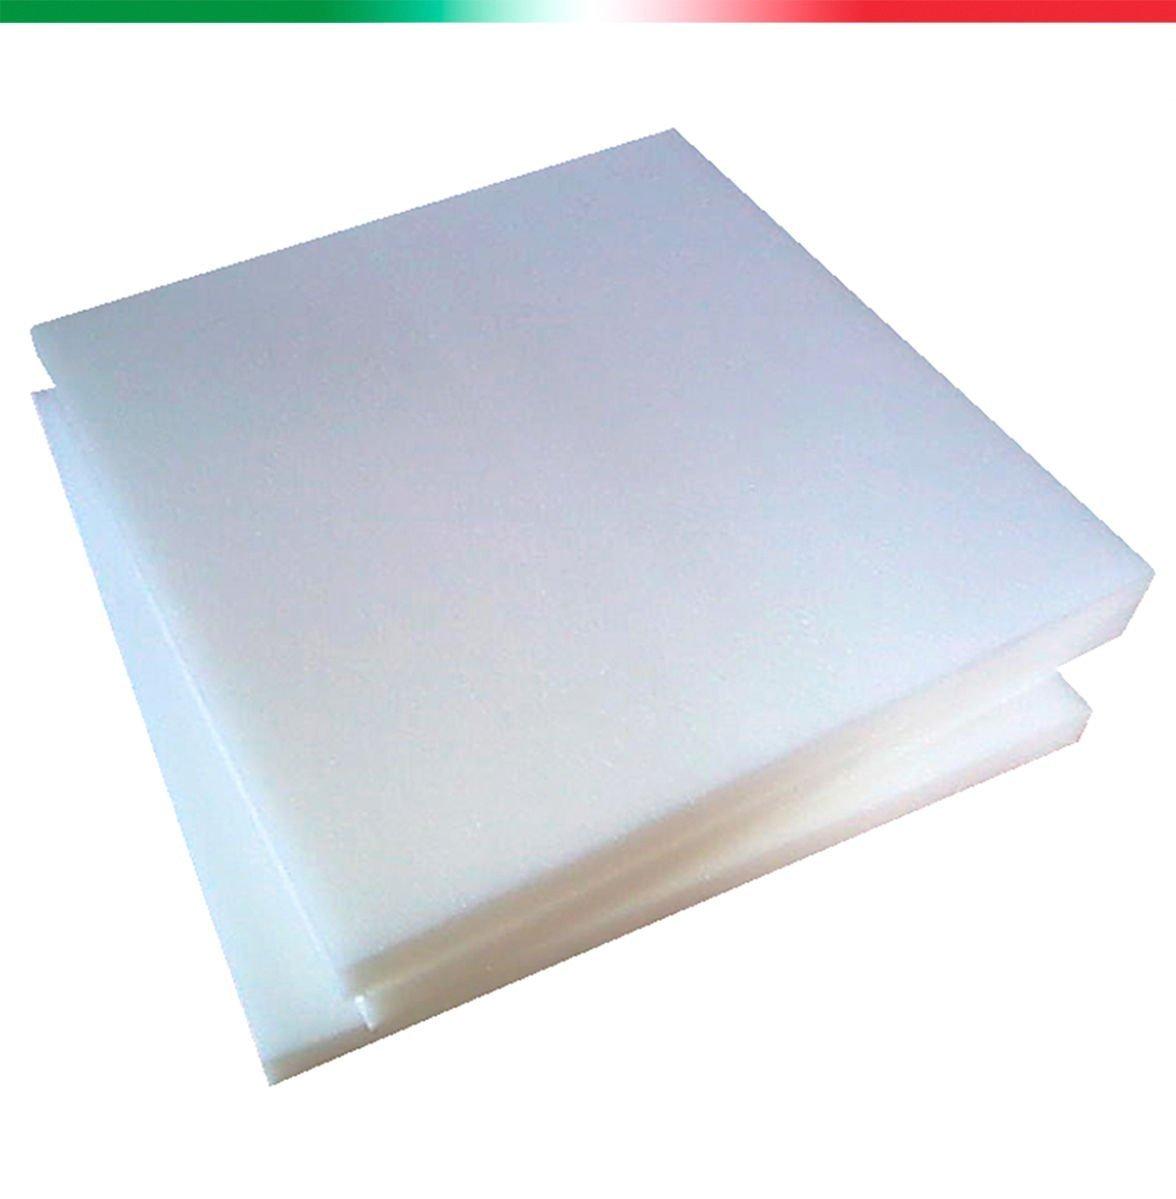 Viglietti - Lámina de gomaespuma/poliuretano expandido de dureza media, 100 x 200 cm, H 2 T21 Blanco: Amazon.es: Hogar